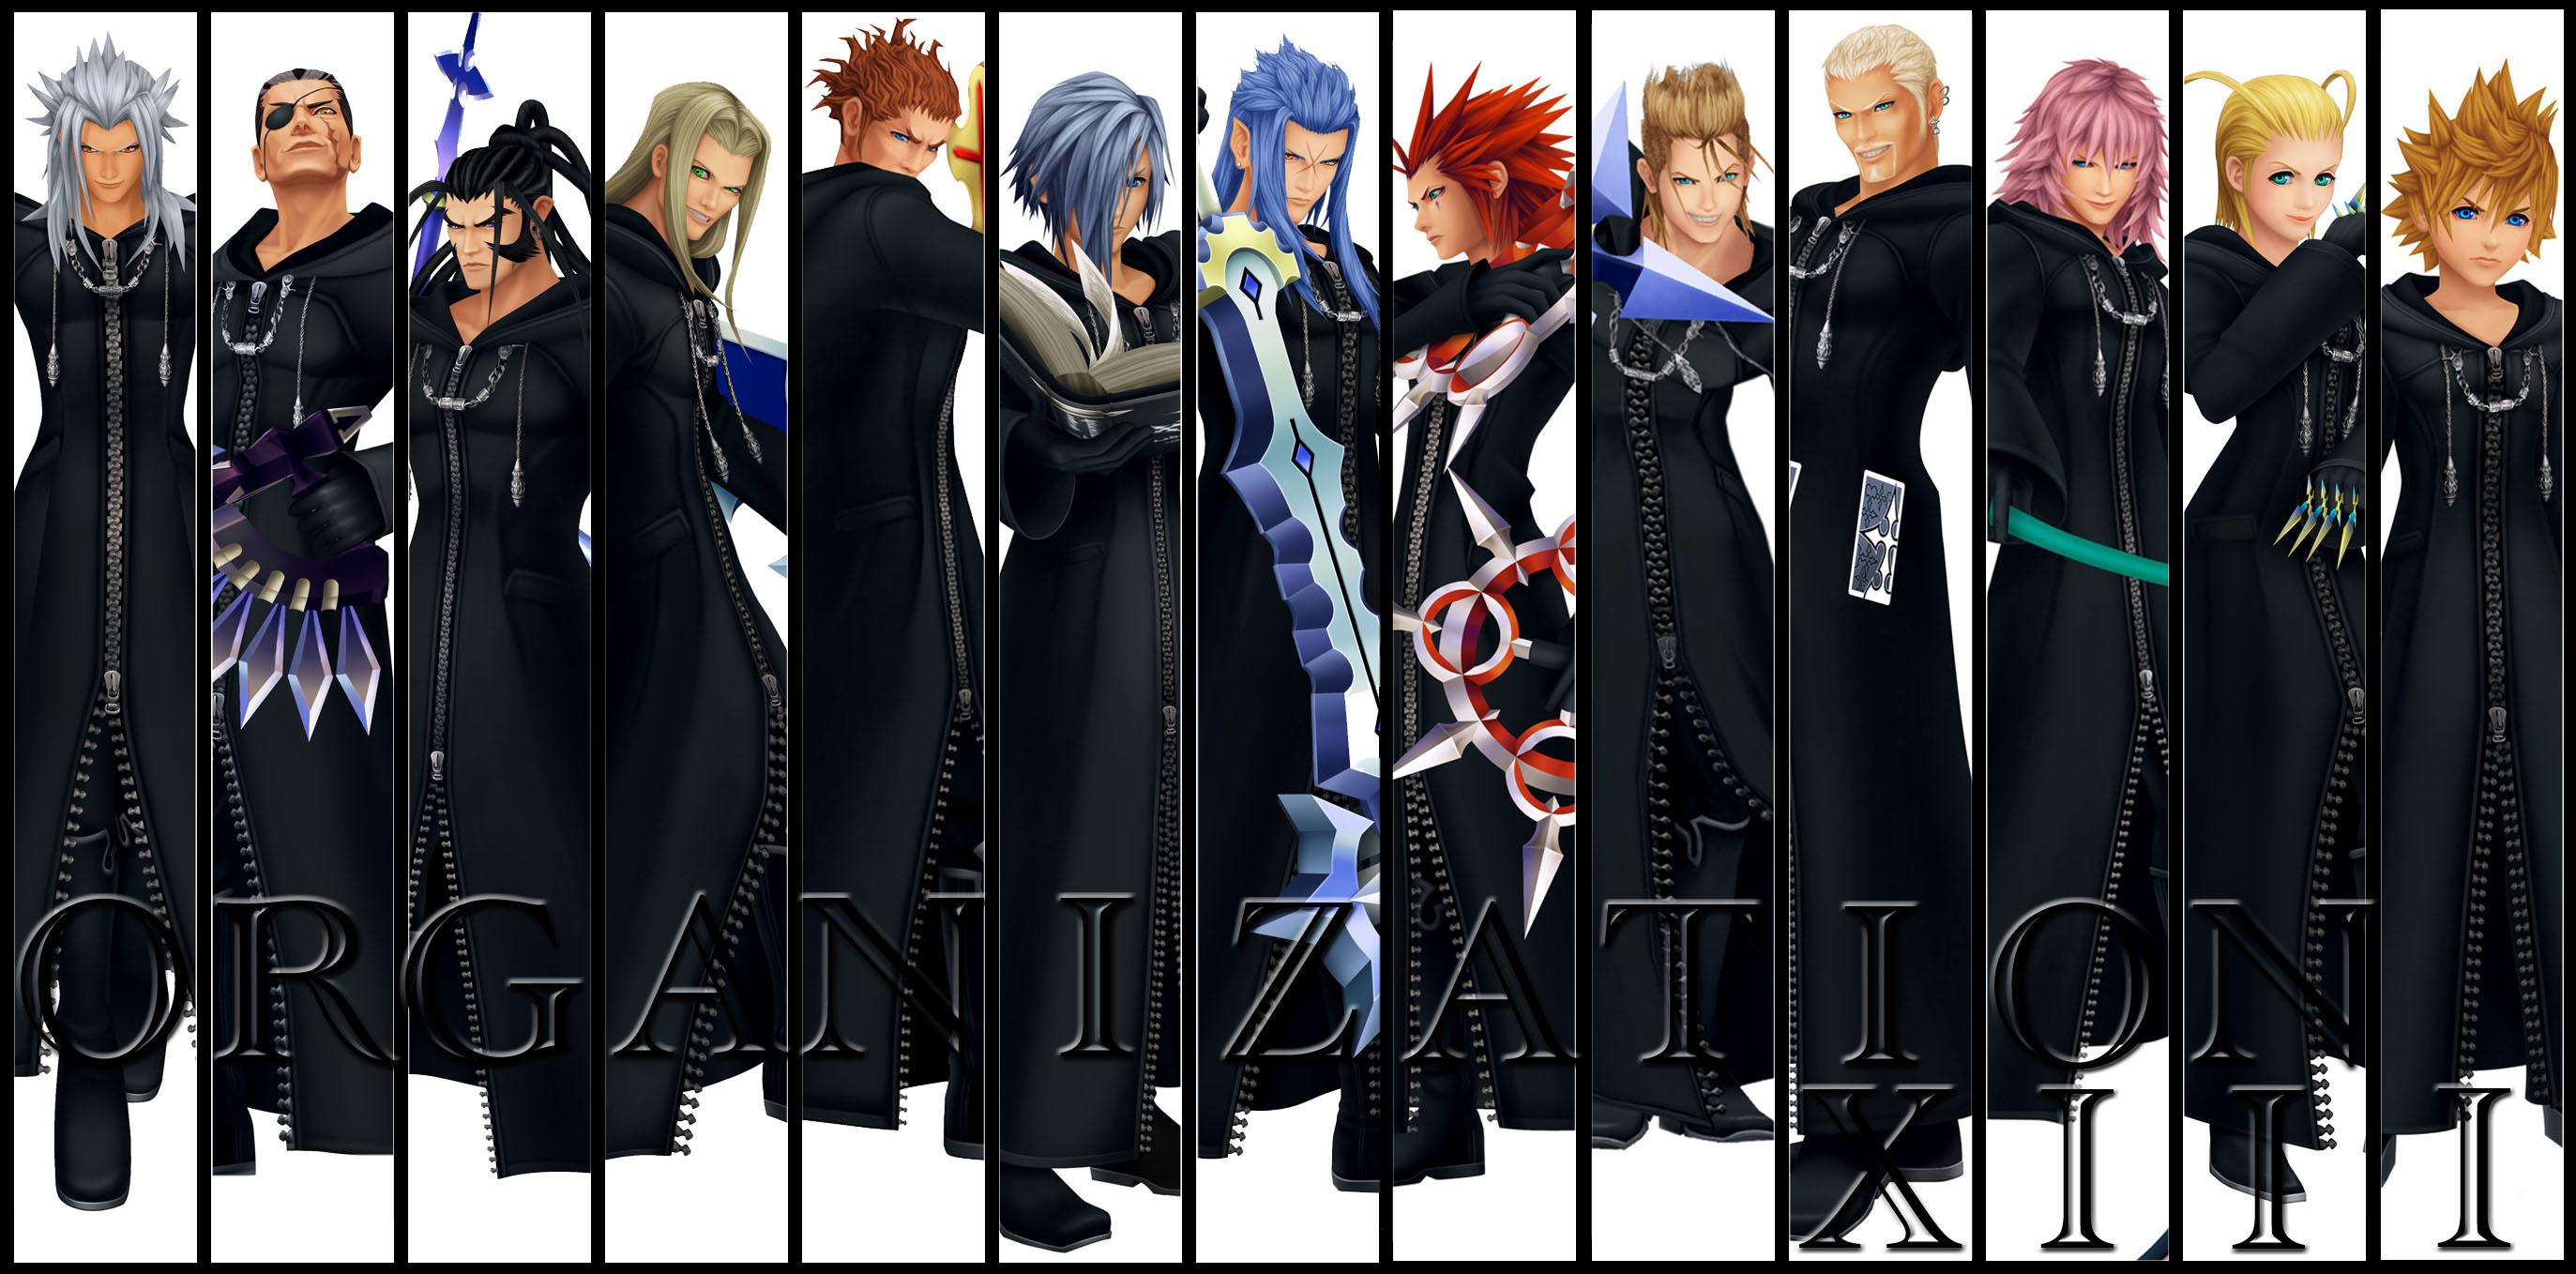 Boss Rush: Organization XIII